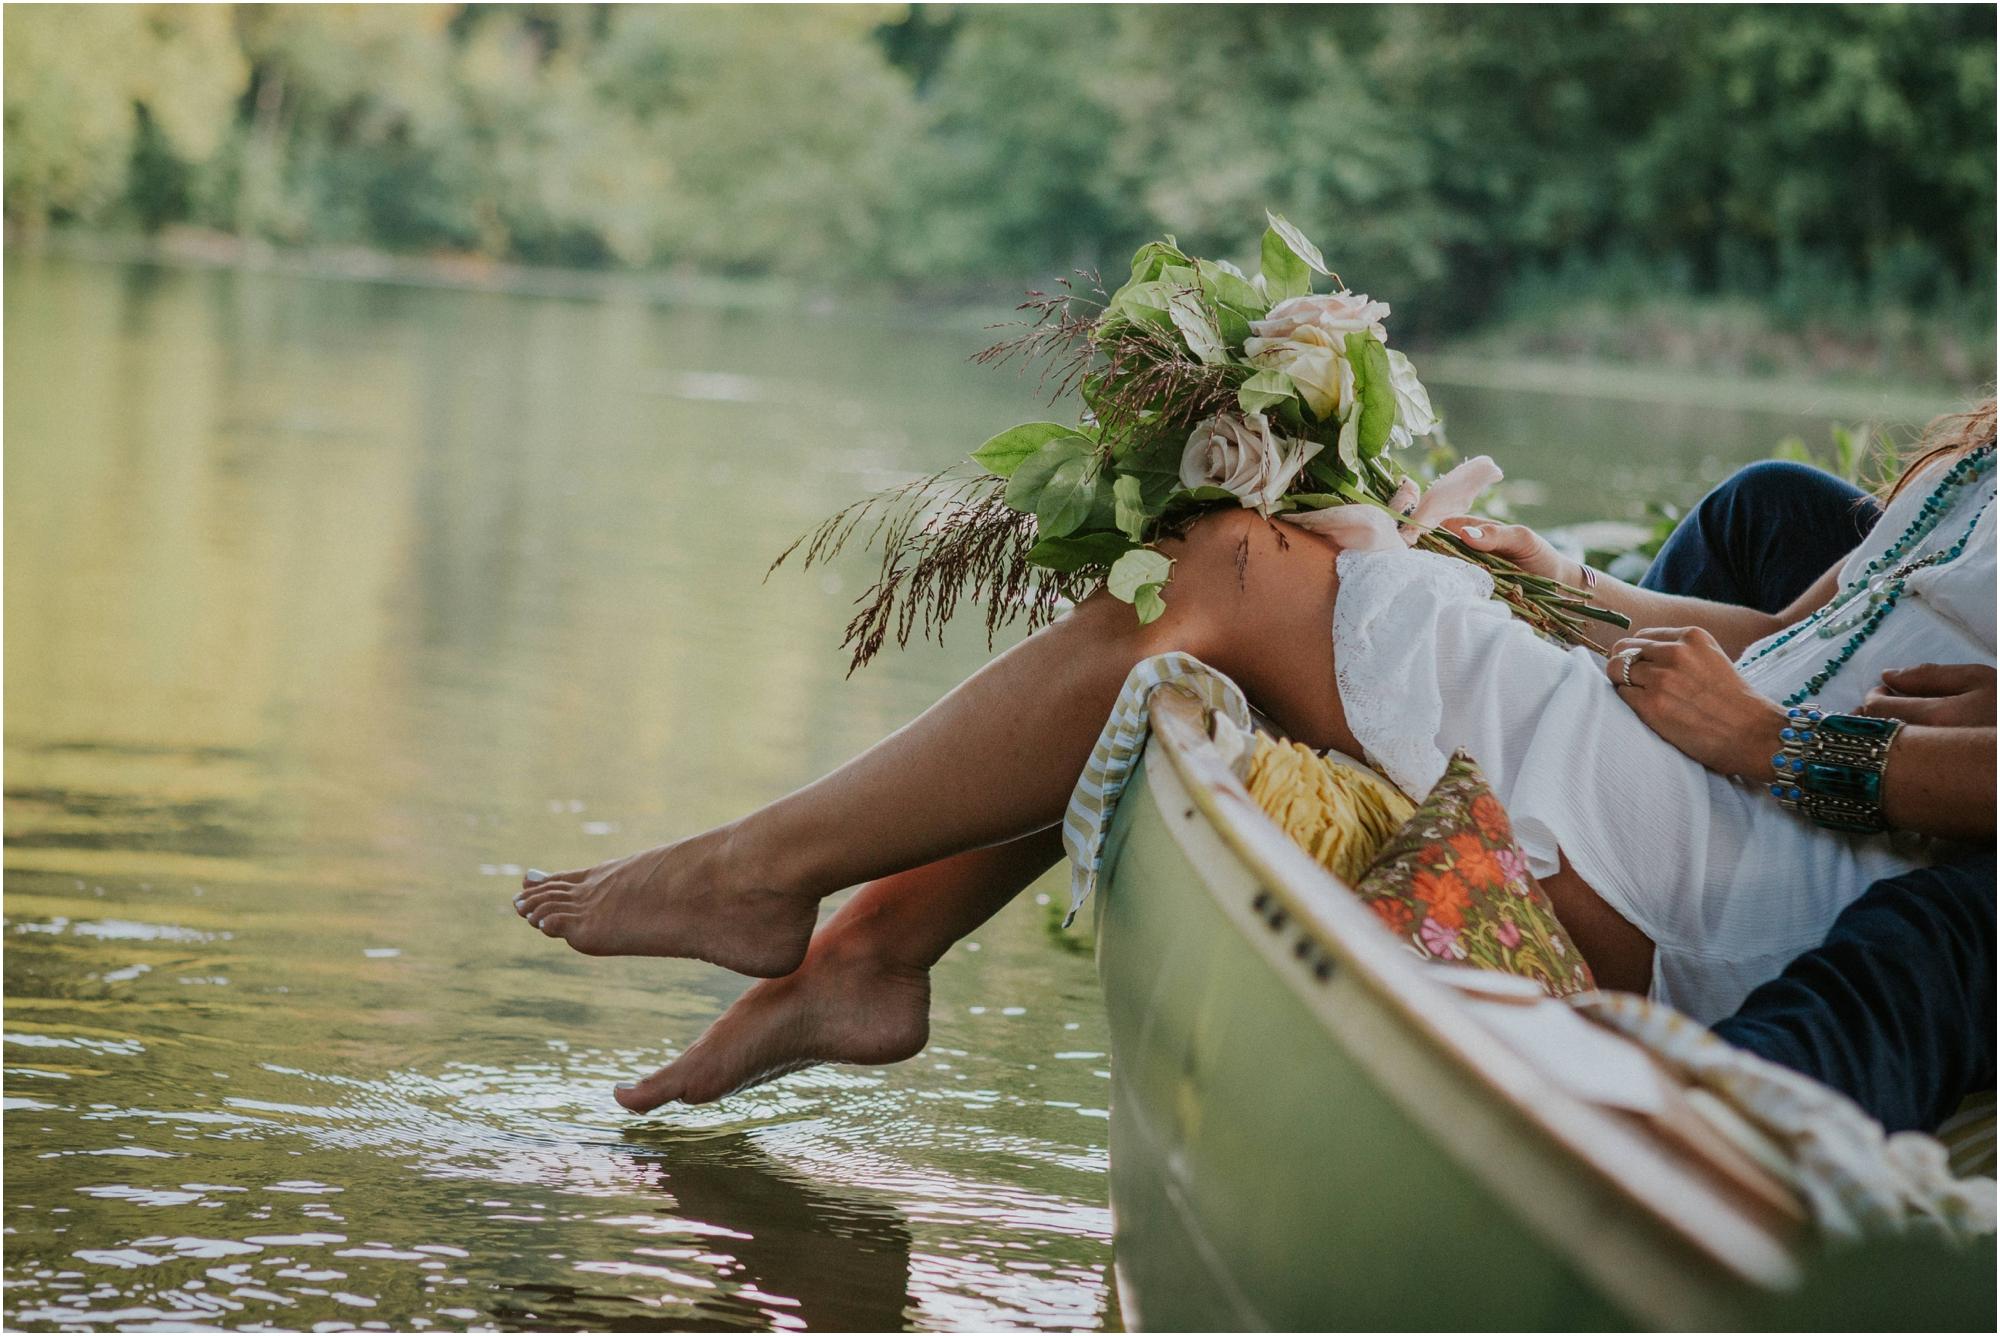 homestead-on-the-holston-hiltons-virginia-bohemian-canoe-styled-shoot-northeast-tennessee-elopement-wild-free-spirit_0023.jpg